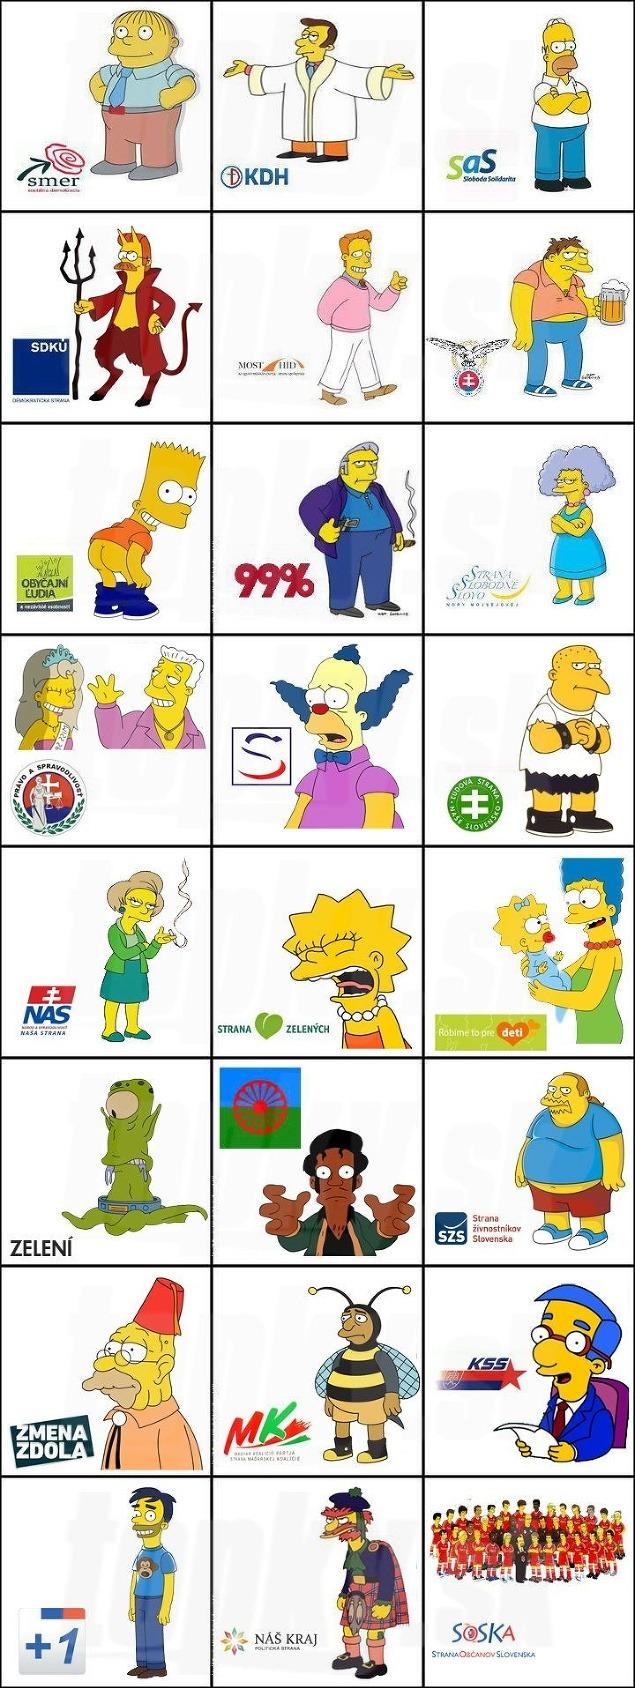 politici-volby-kampan-vtipne-obrazky-Simpsonovci - vtipný obrázok - Kalerab.sk